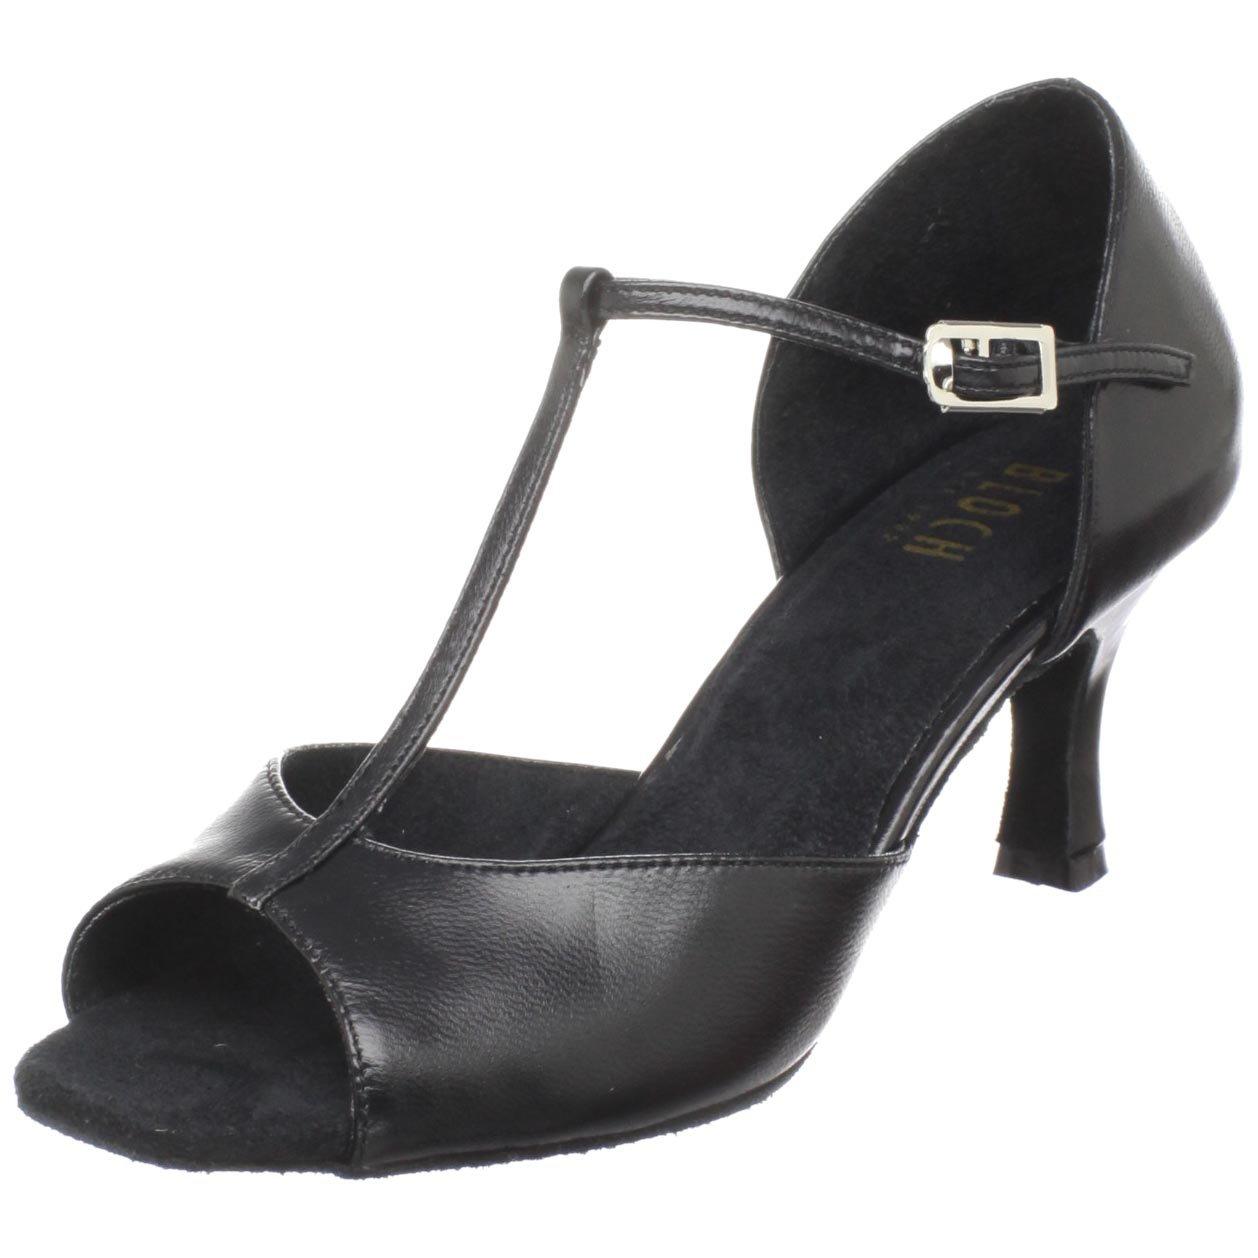 Bloch Dance Women's Issabella Ballroom Shoe,Black,7 M US